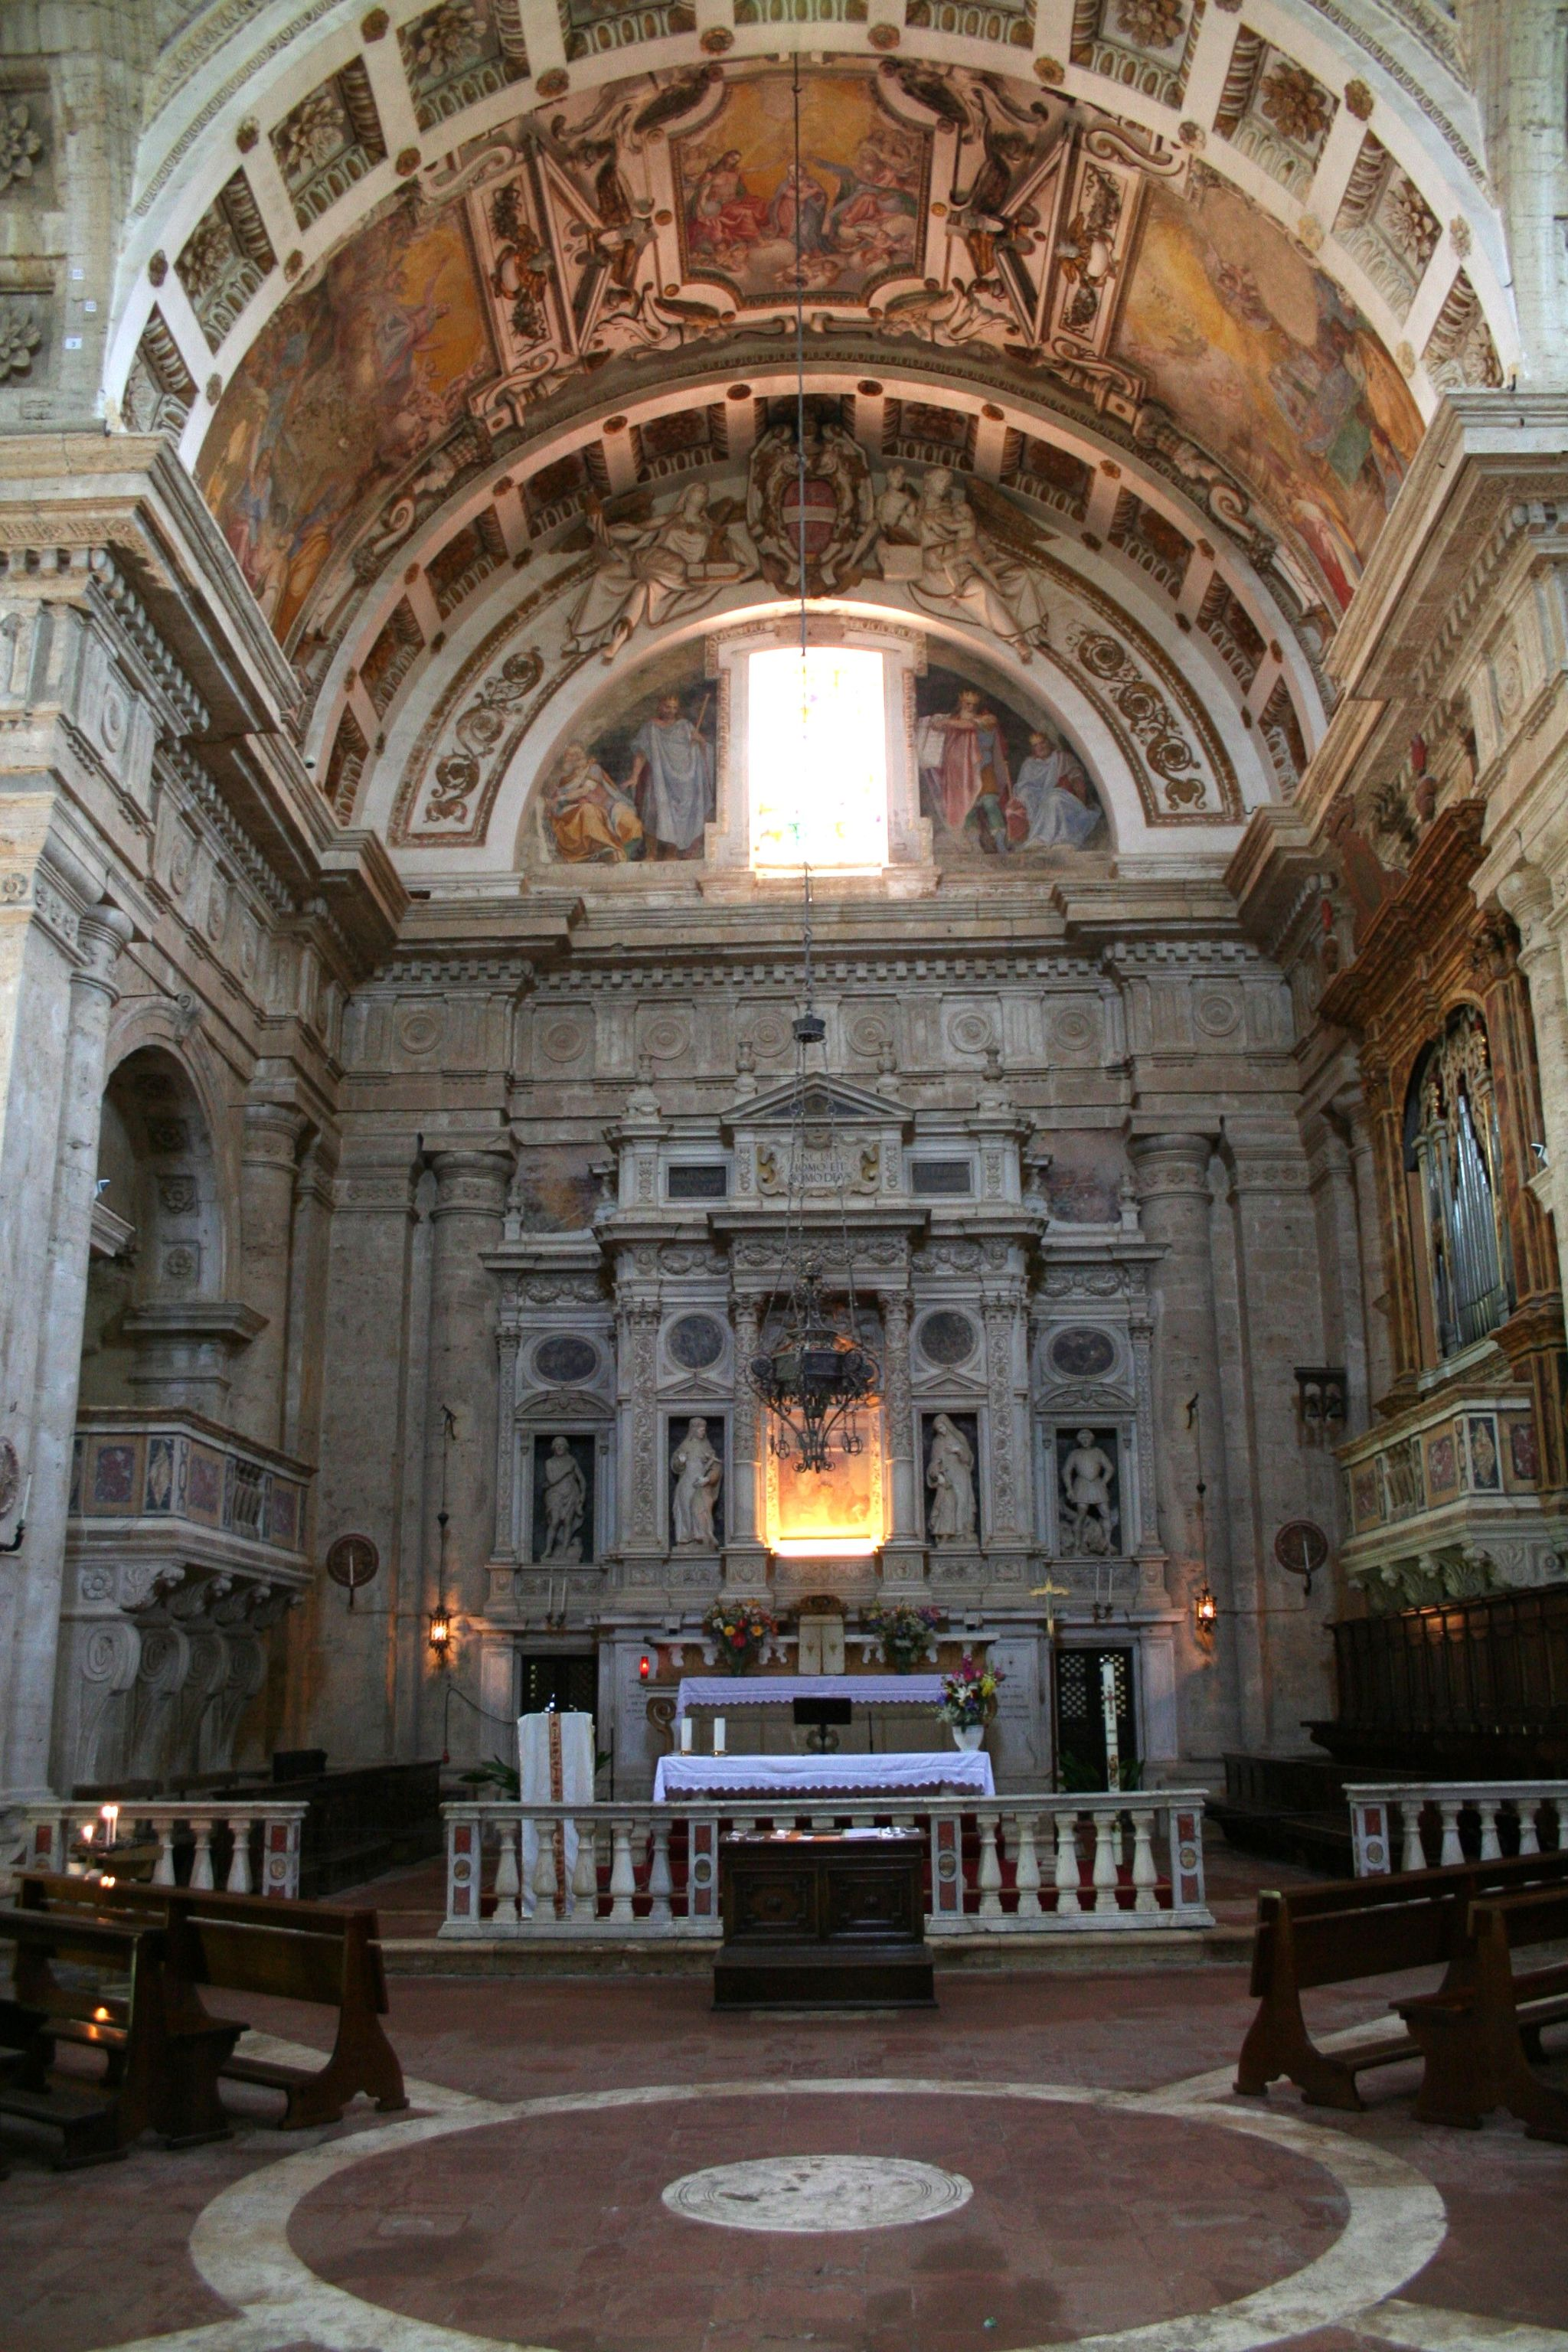 San Biagio inside